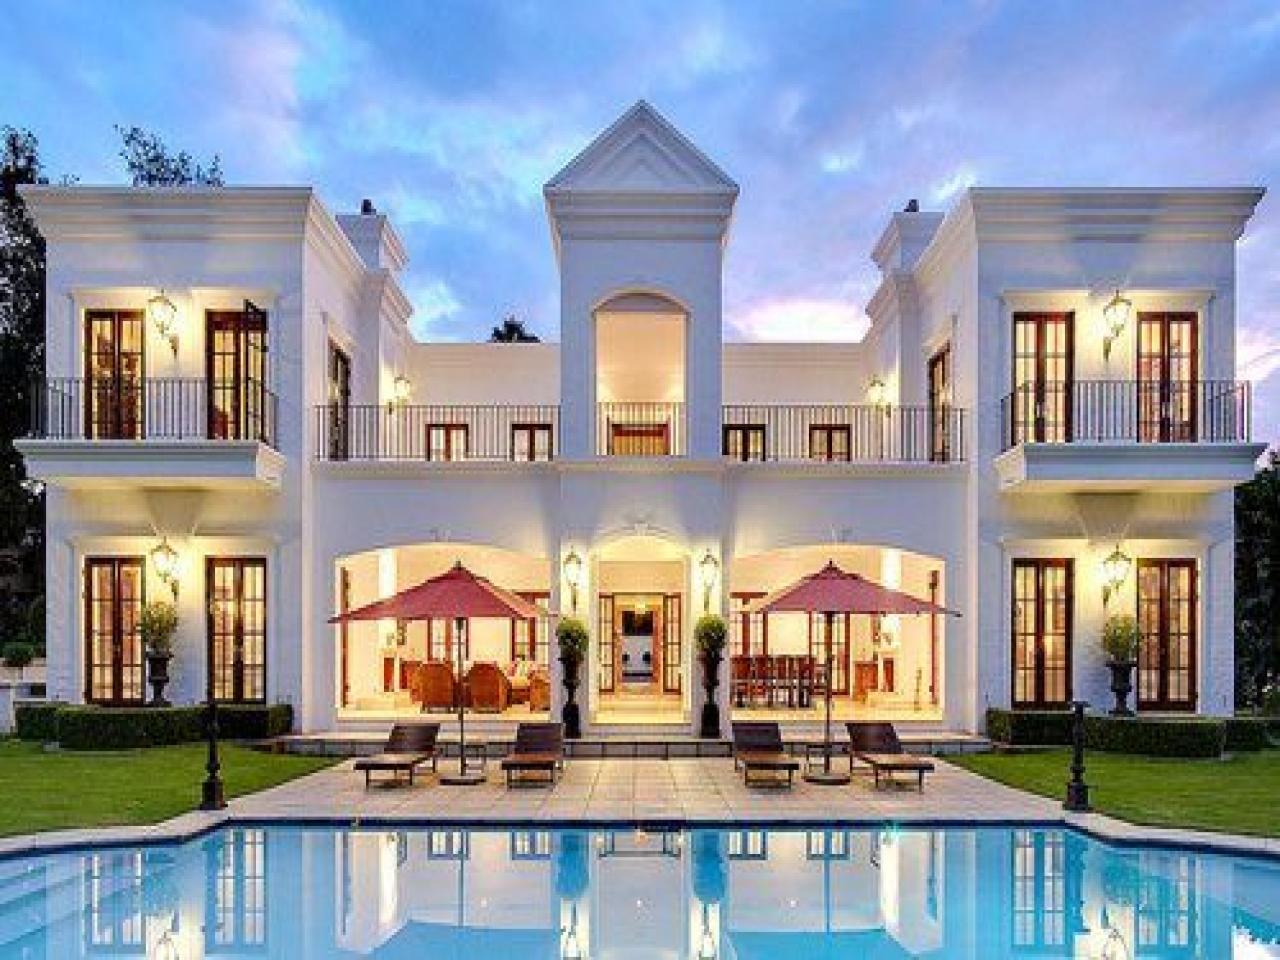 Astonishing Big Beautiful Homes Of Pattern Pretty Es Acnn Decor